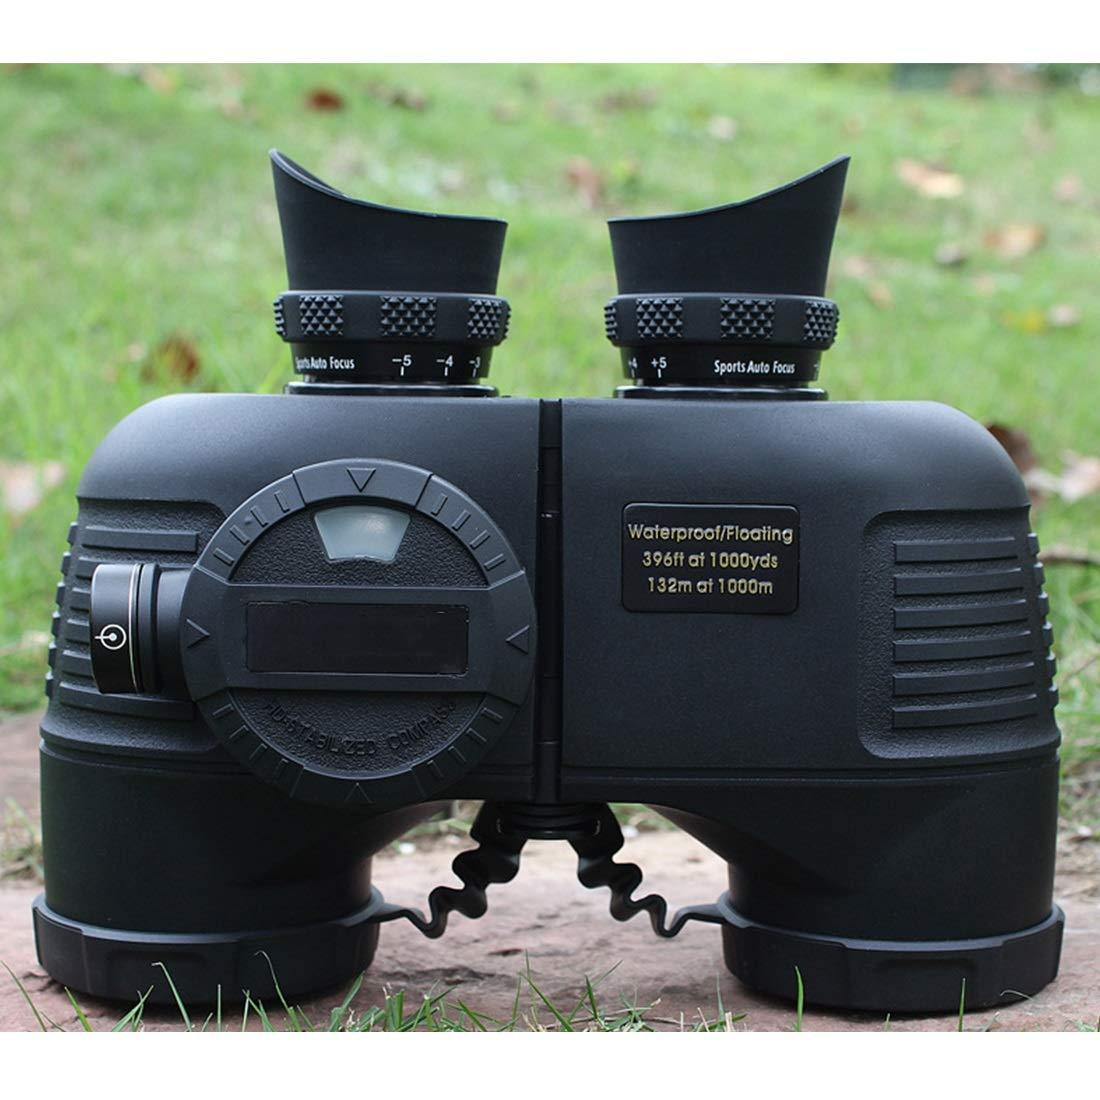 JPAKIOS 望遠鏡 7x50双眼鏡 アウトドア 旅行 コンサート用 相撲観戦 歌舞伎鑑賞 狩猟 収納バッグ付き BAK4プリズムFMCレンズ コンパス 羅針盤 (Color : ブラック)  ブラック B07PLTYT12